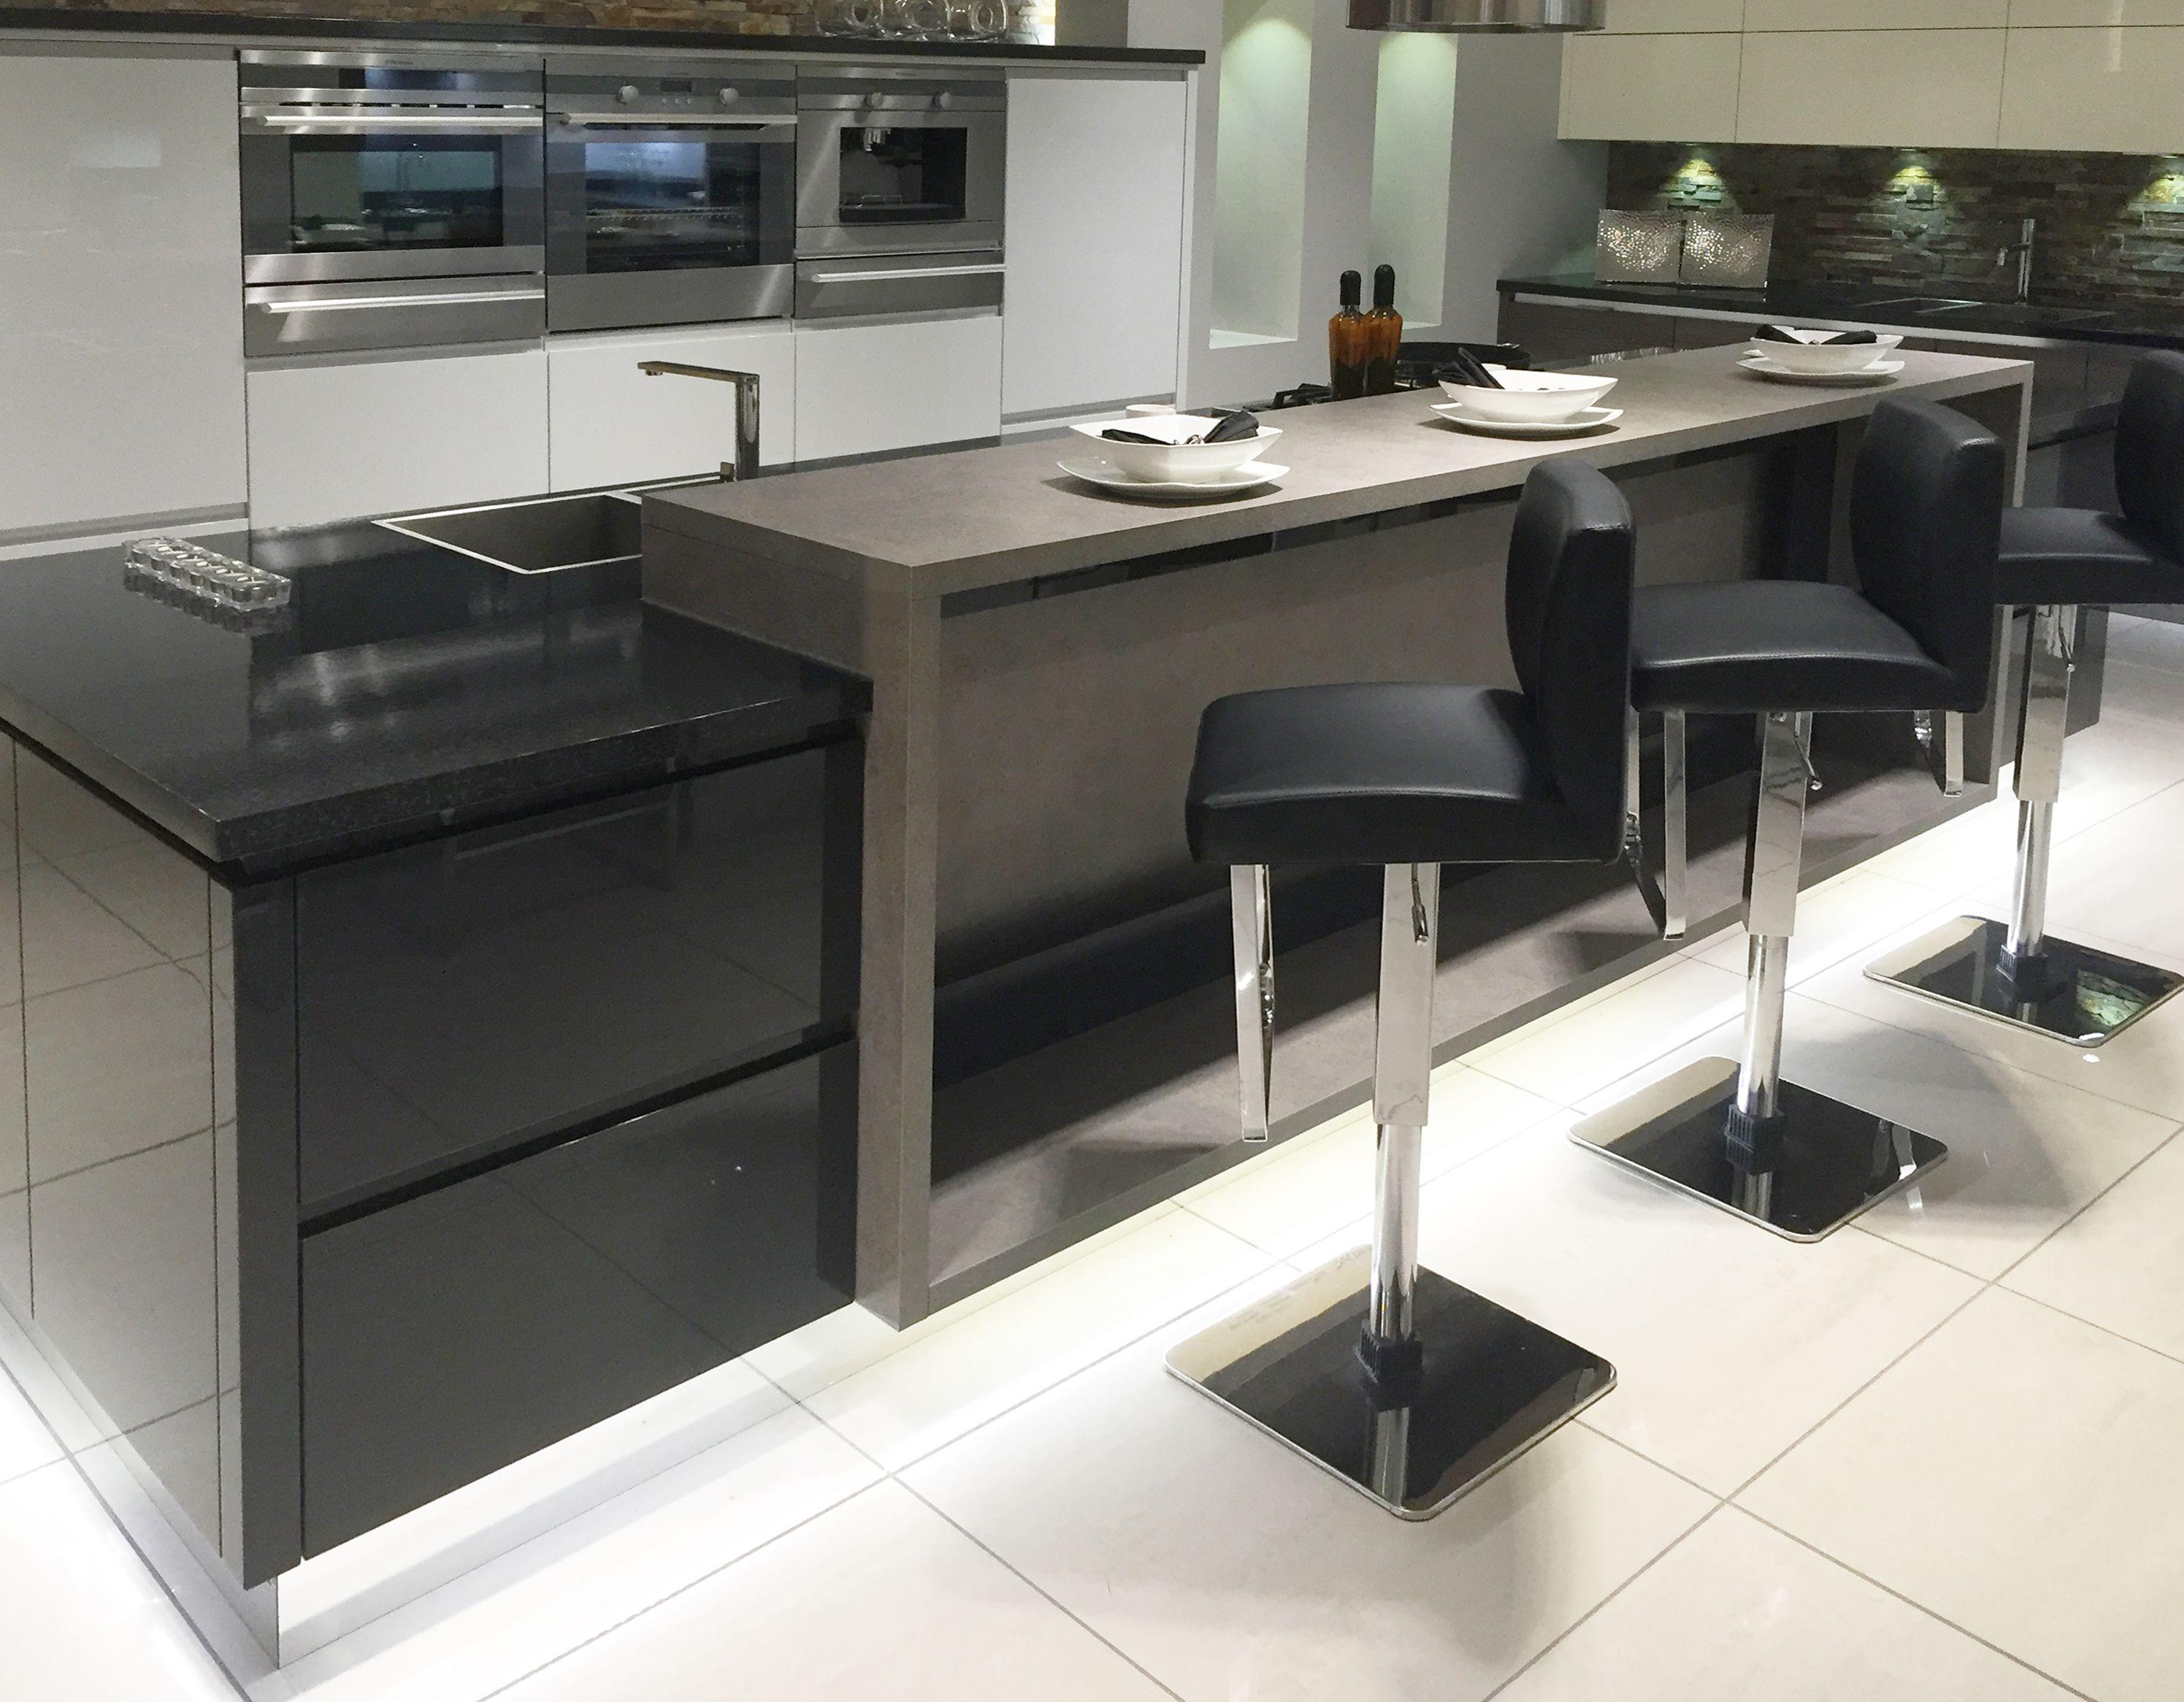 Modern Kitchen Island Design With Raised Breakfast Bar Area And